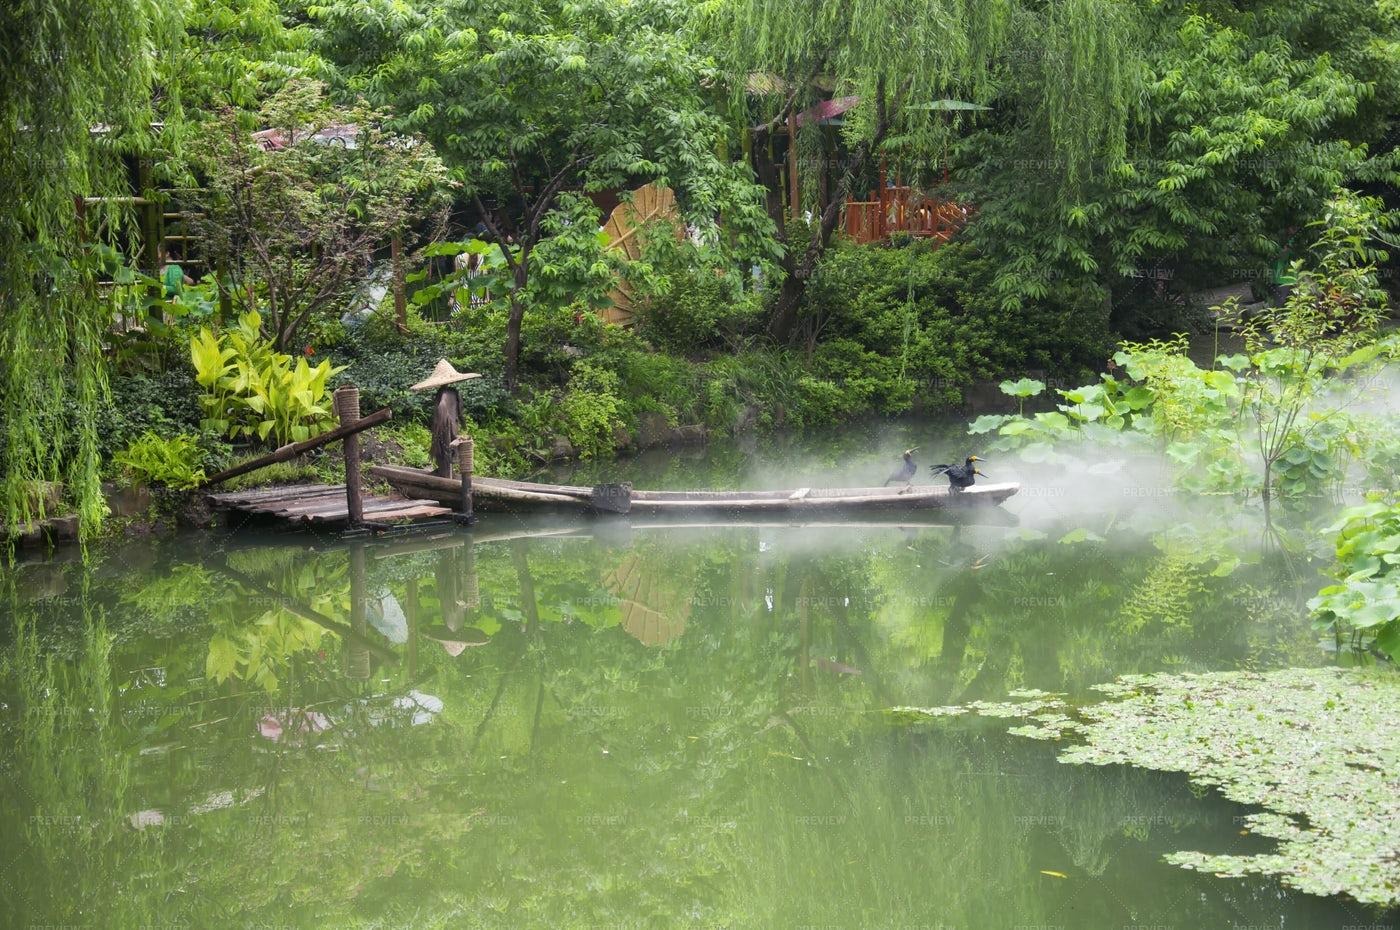 Guyi Gardens In China: Stock Photos